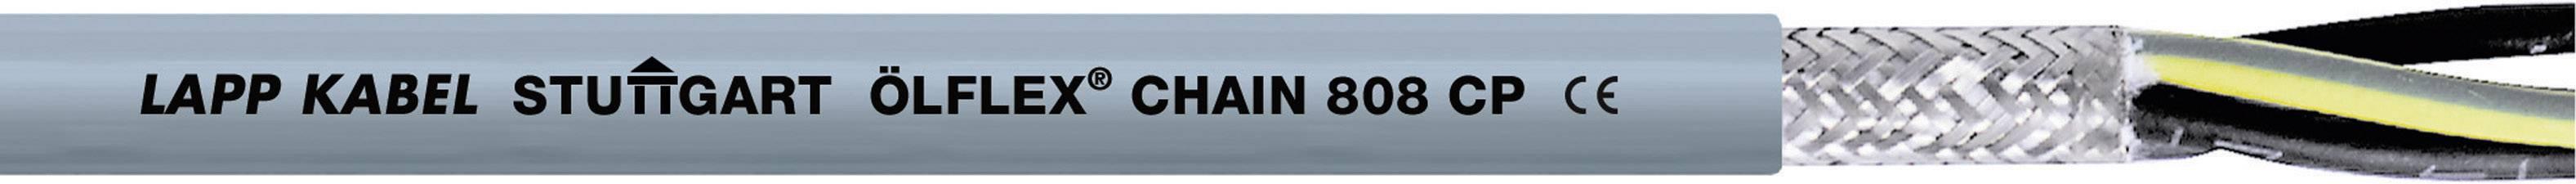 Žíla kabelu LappKabel ÖLFLEX CHAIN 808 CP 7G1,5 (1027779), 7x 1,5 mm², polyurethan, Ø 10,9 mm, stíněný, 1 m, š